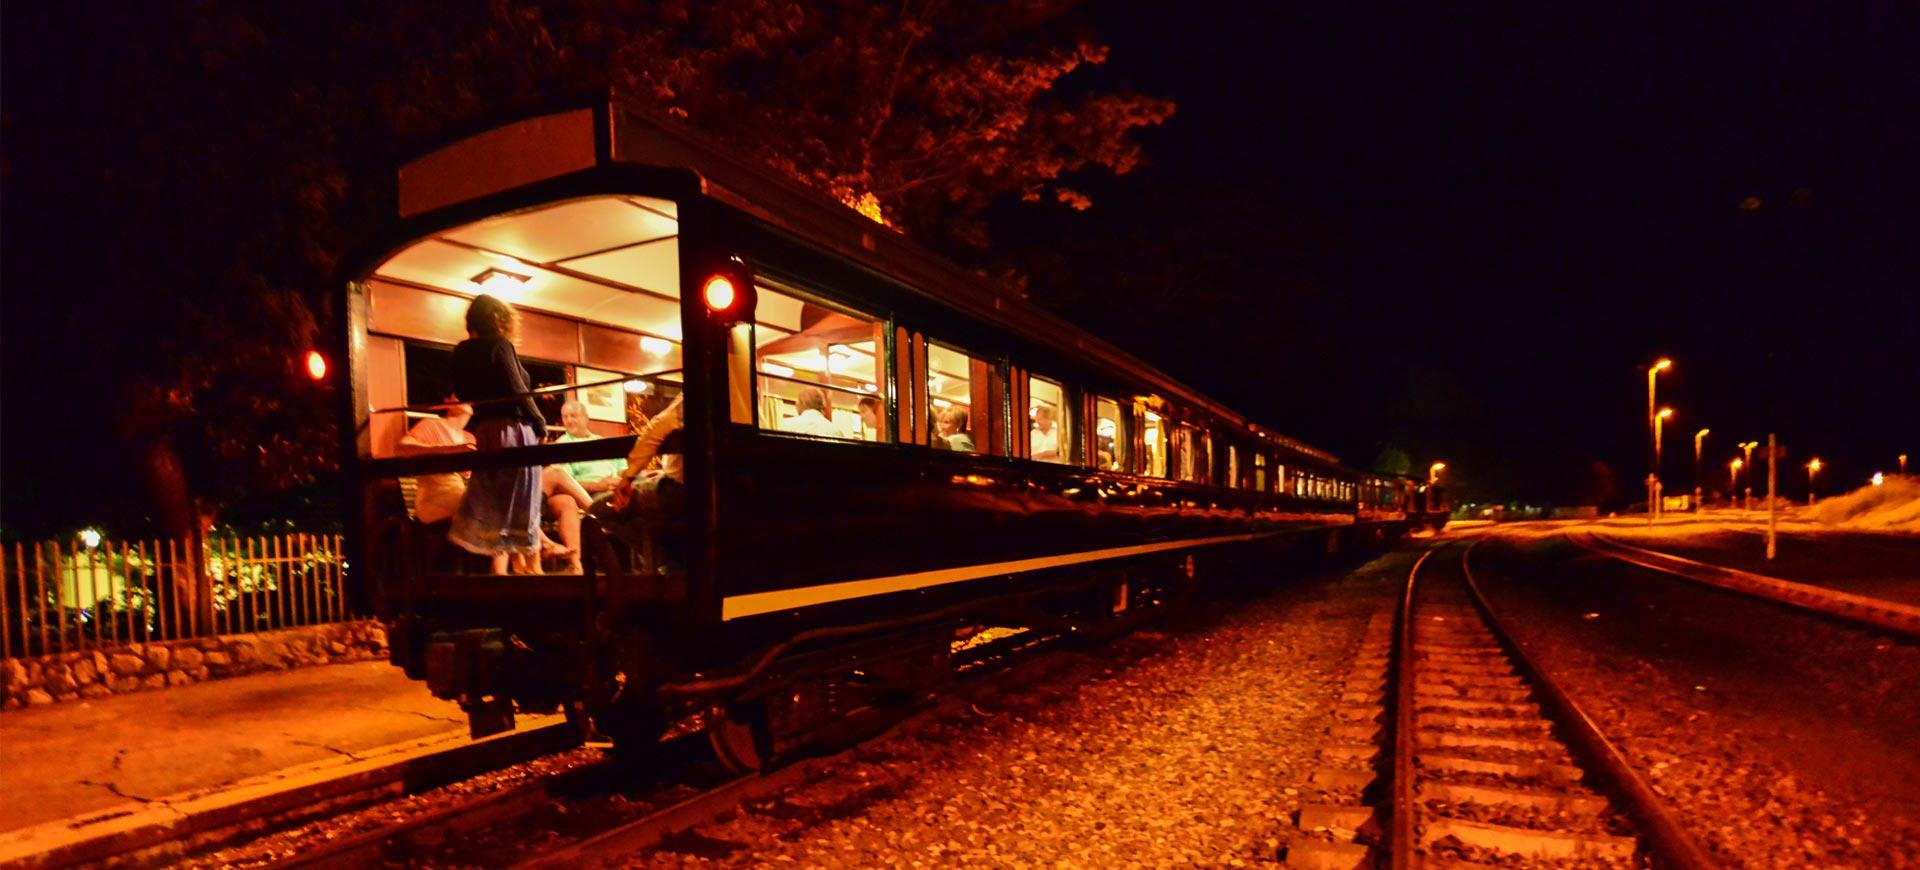 Victoria Falls Steam Train Trip